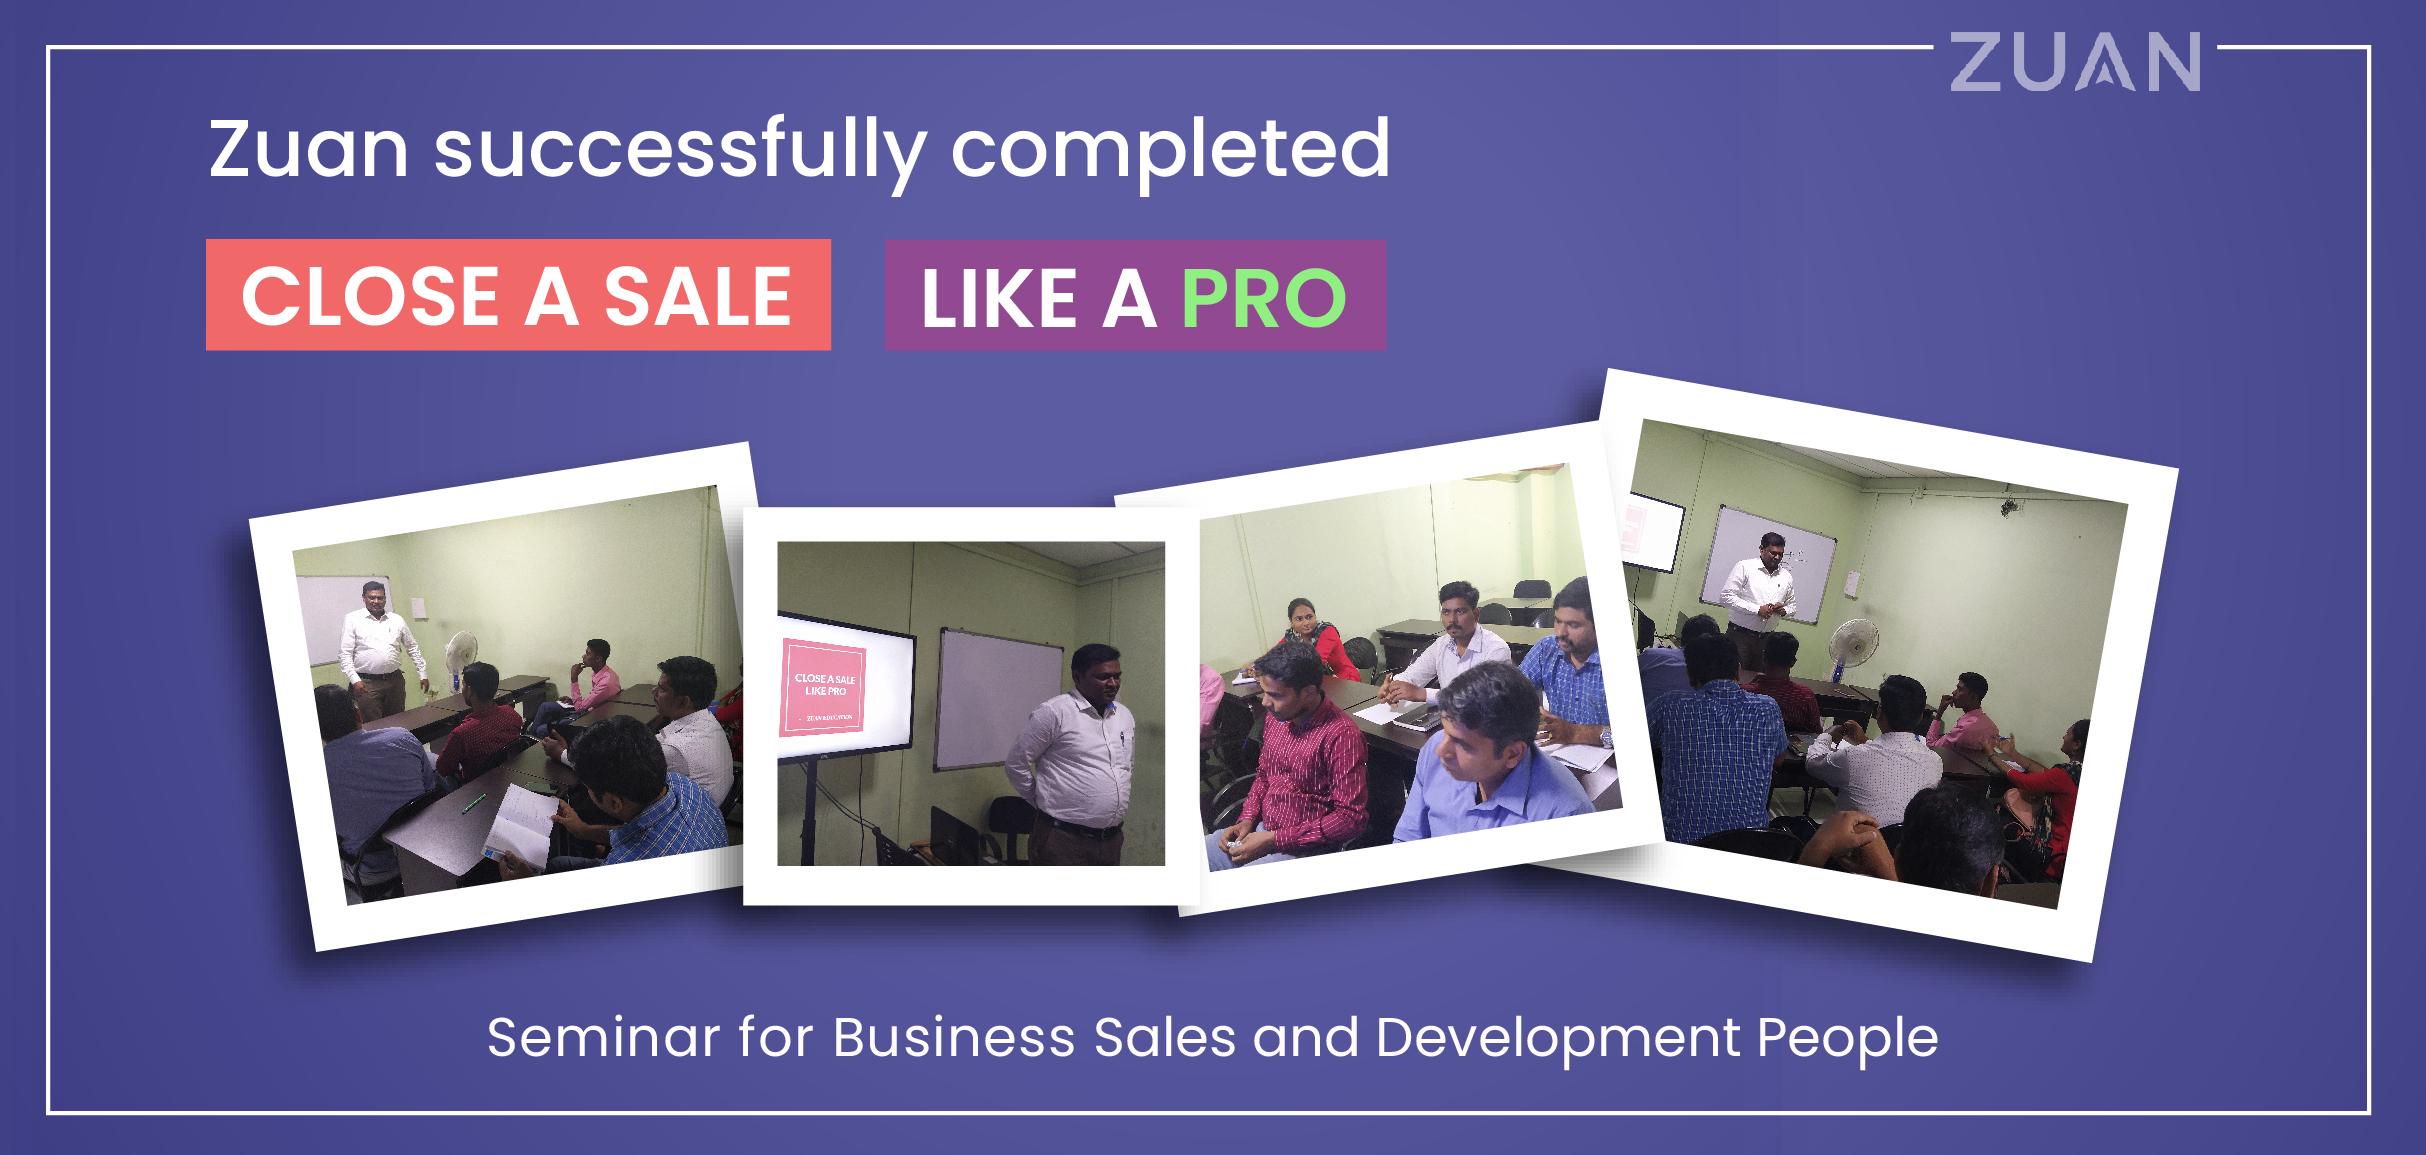 Close a Sale like a Pro seminar